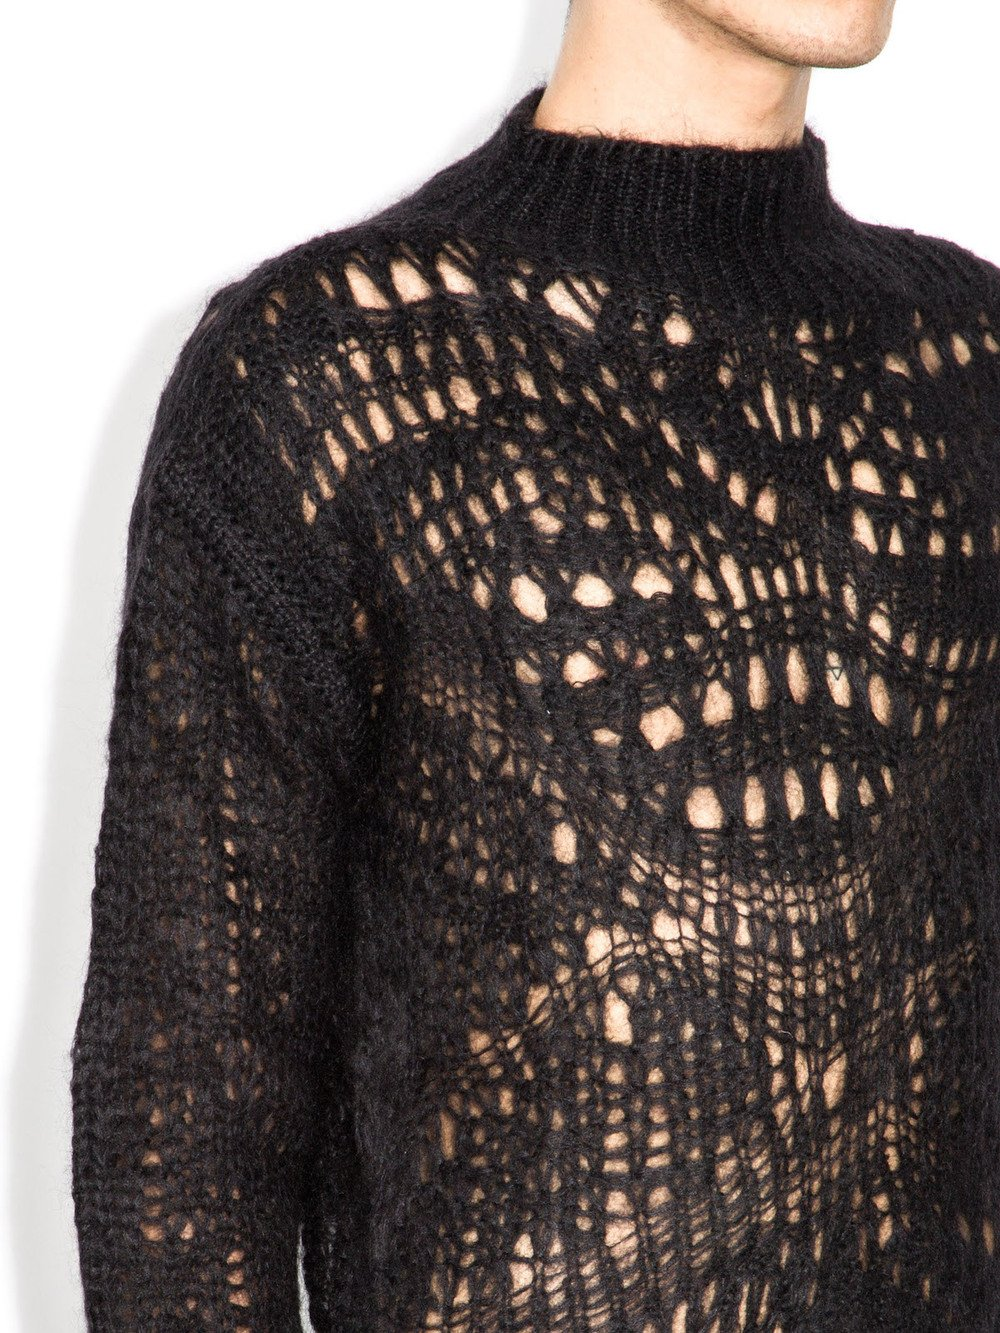 rick owens black sweater